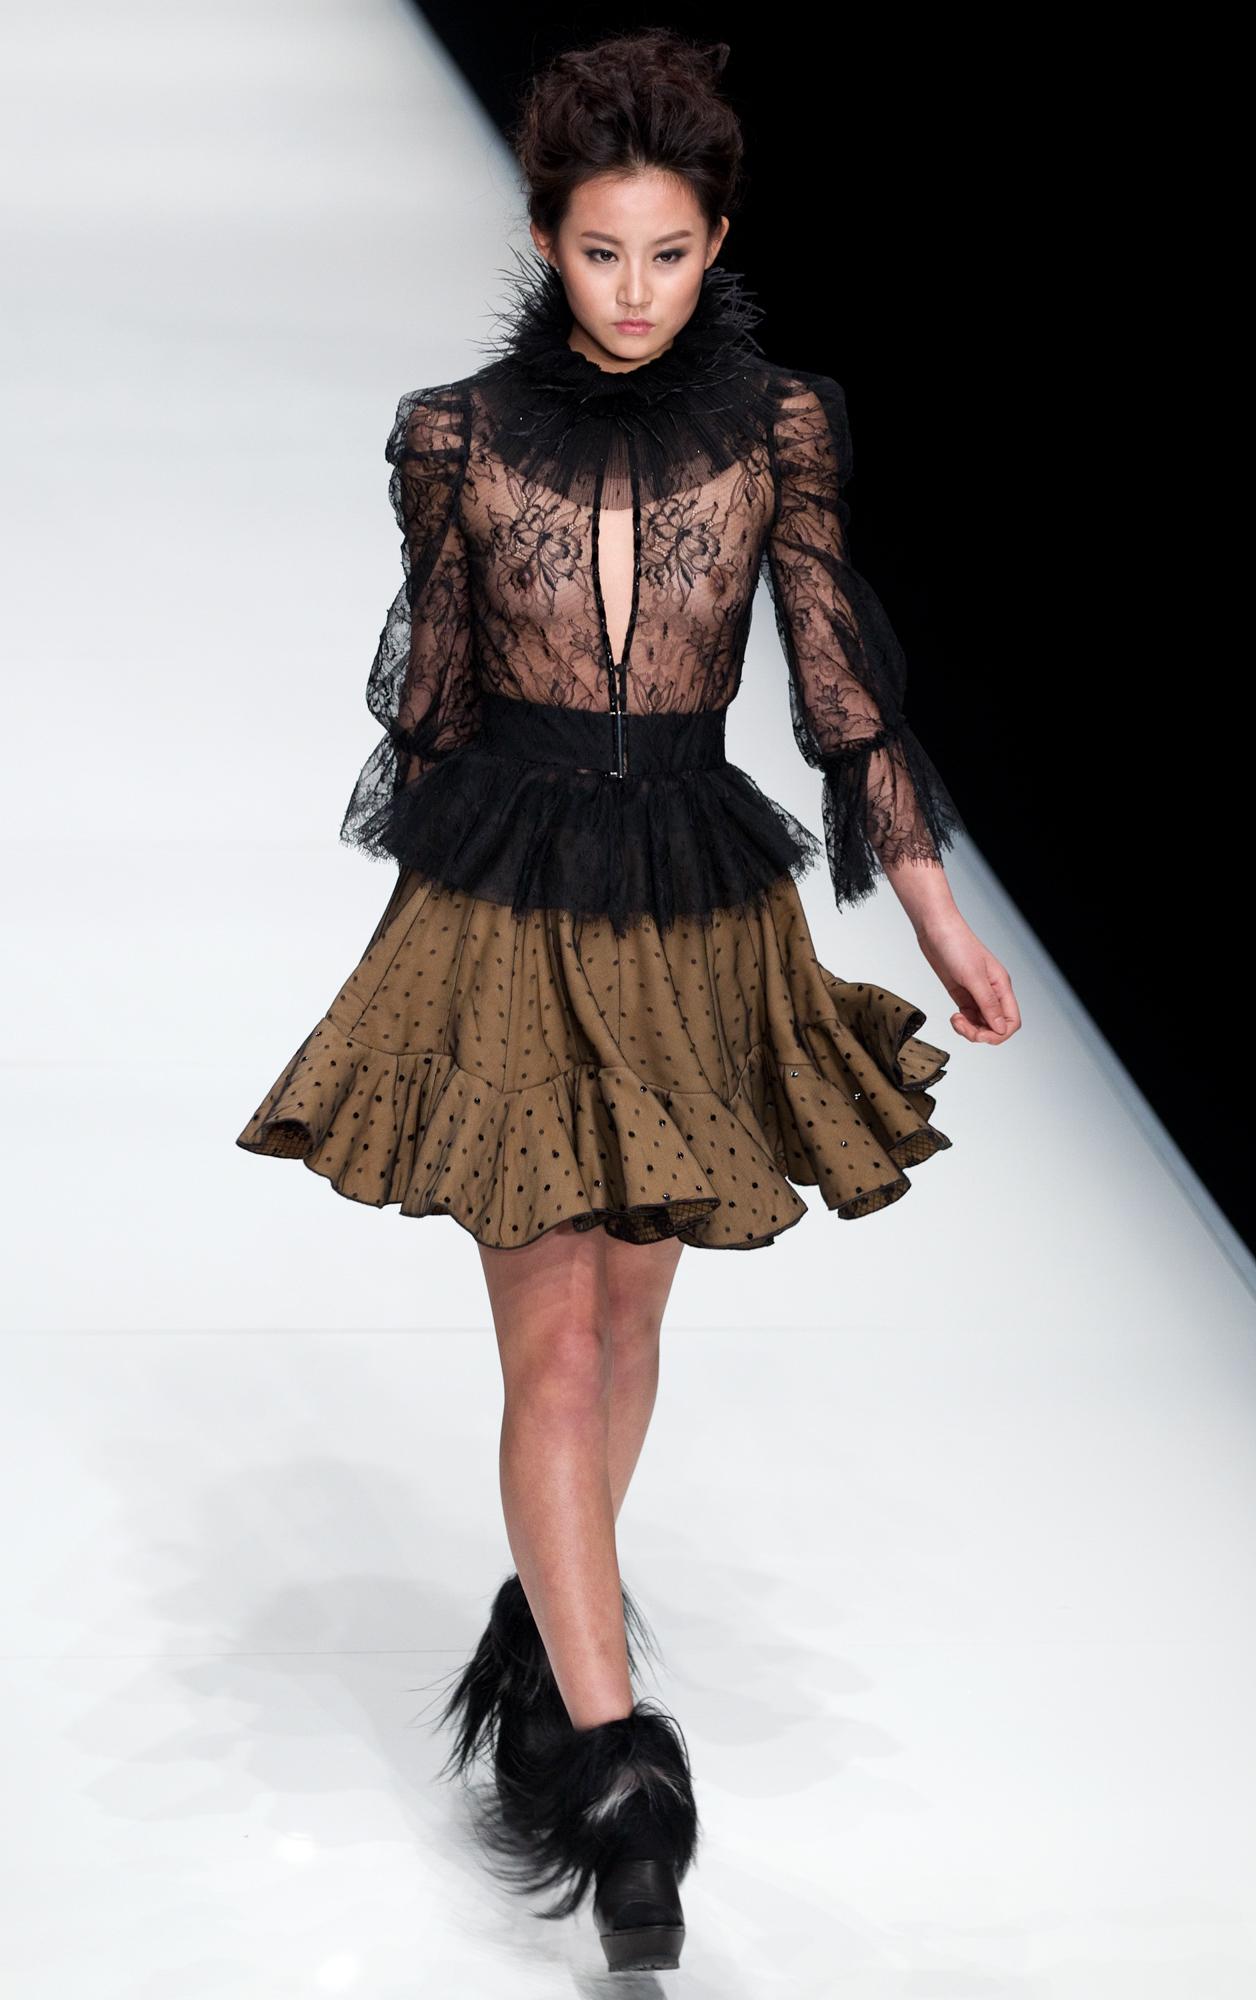 2009-2014 China Fashion Week – Yuan Images